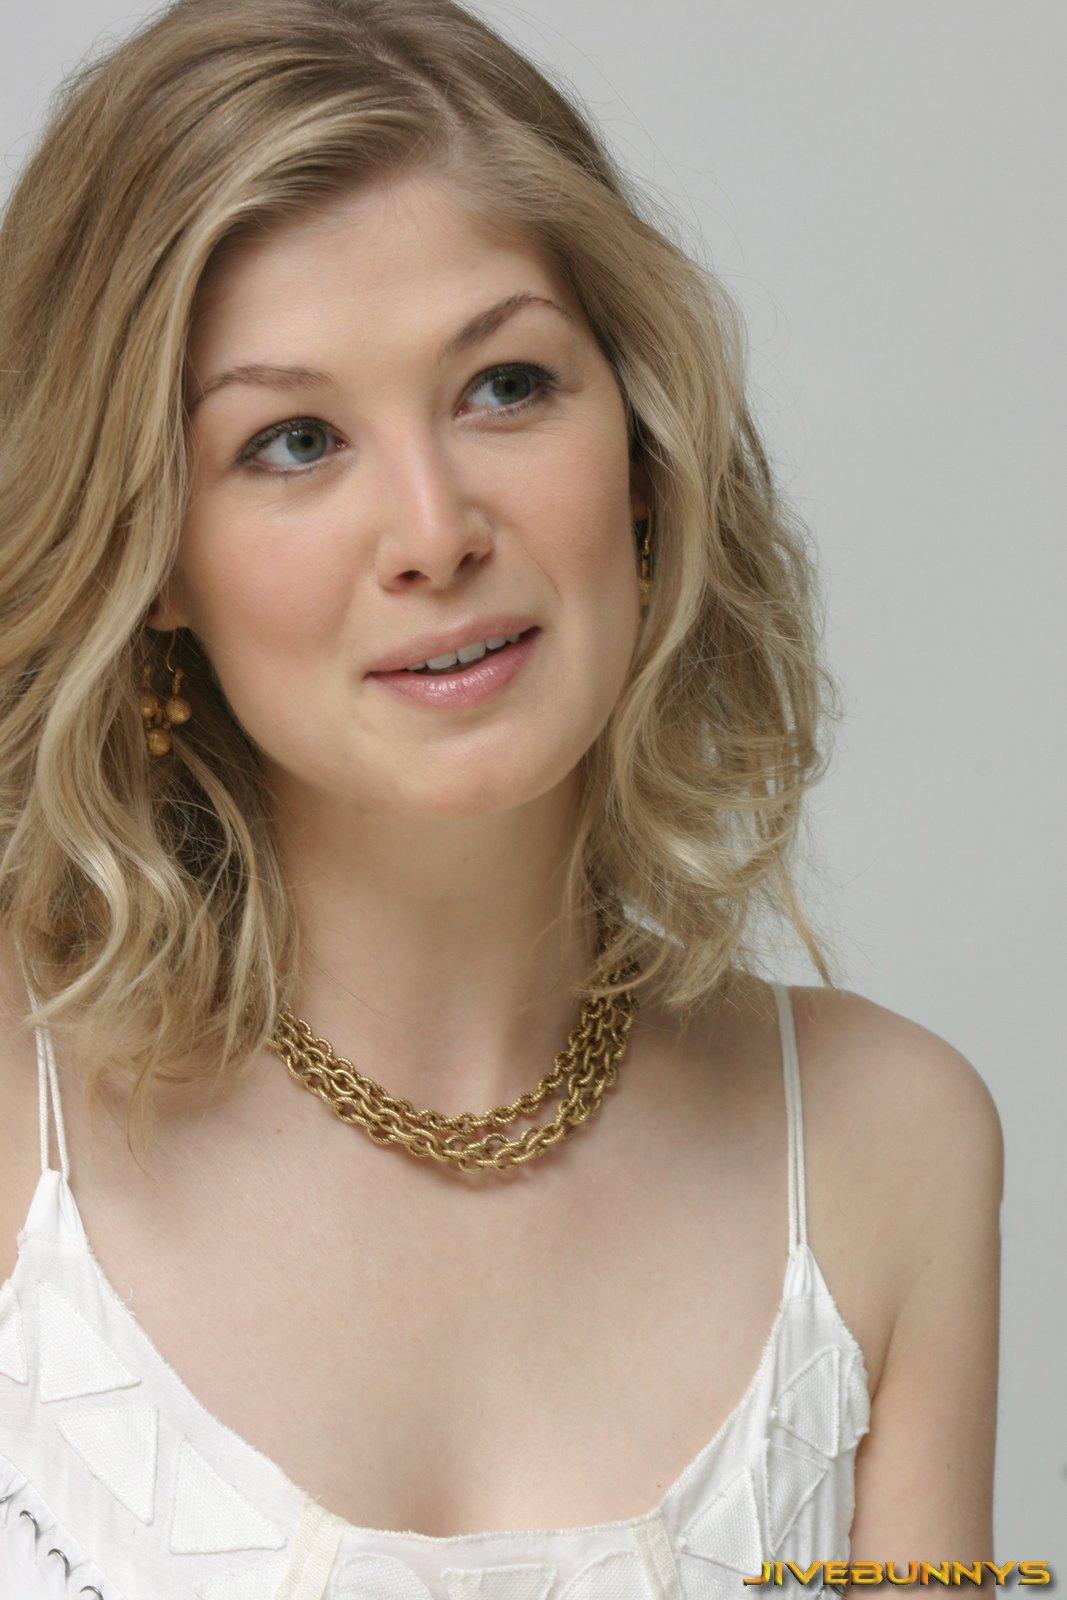 Pike actress rosamund